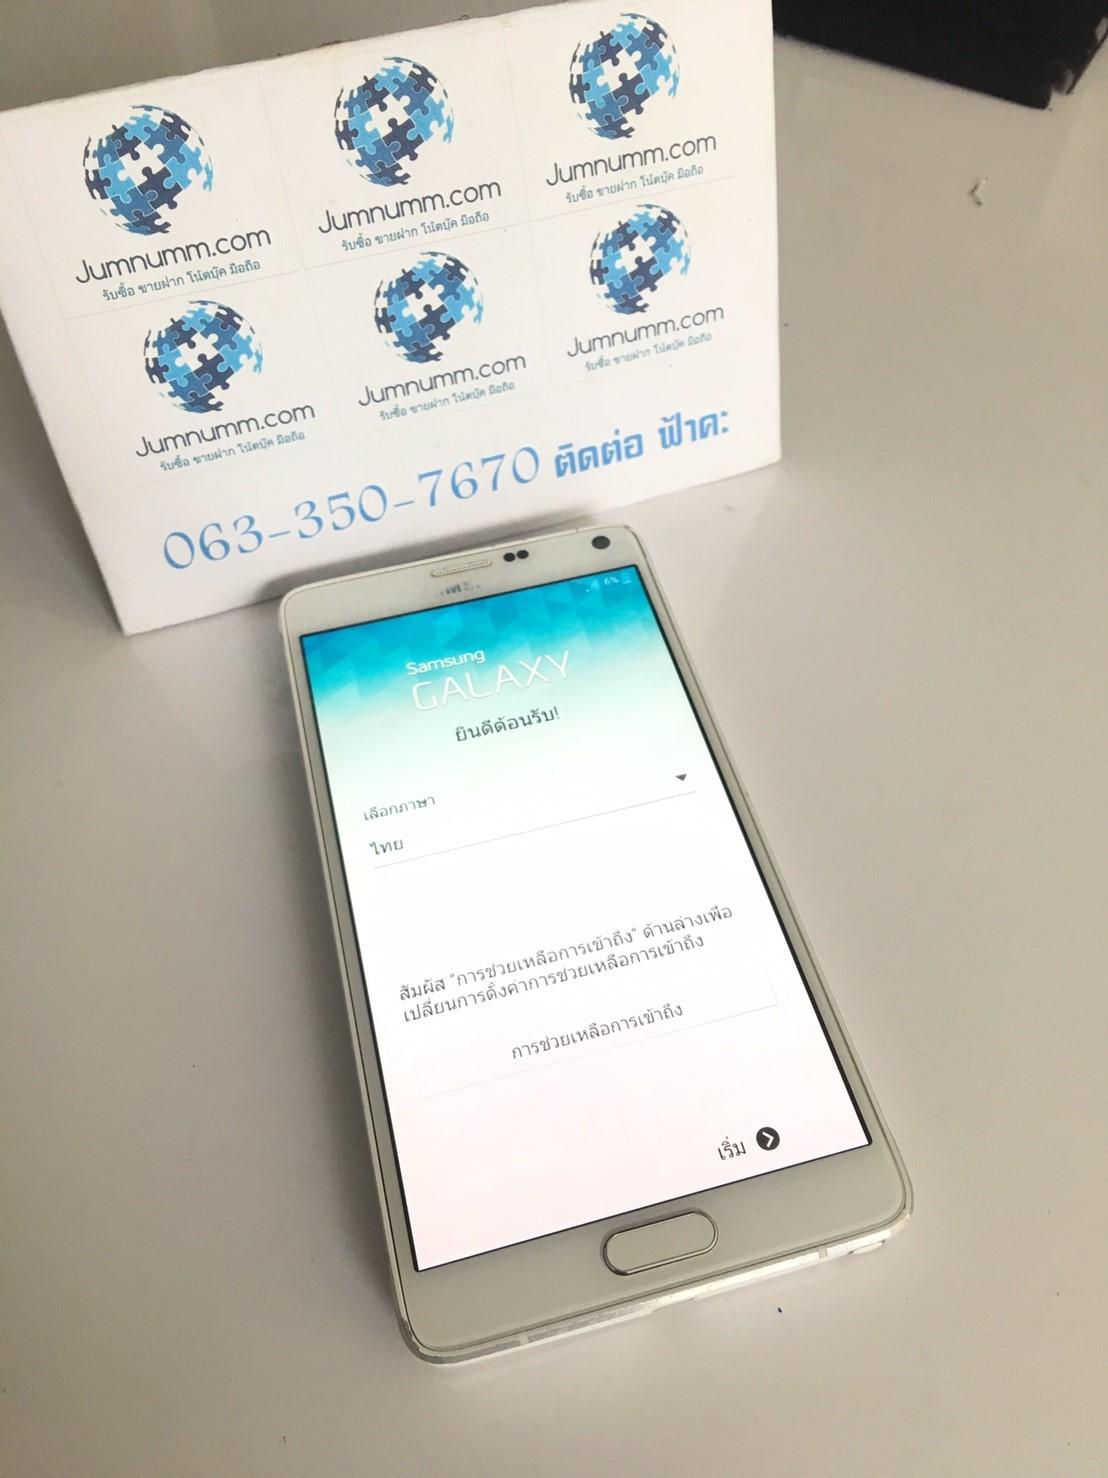 JMM-28 ขายSamsung Galaxy Note4 ราคา 6,900 บาท